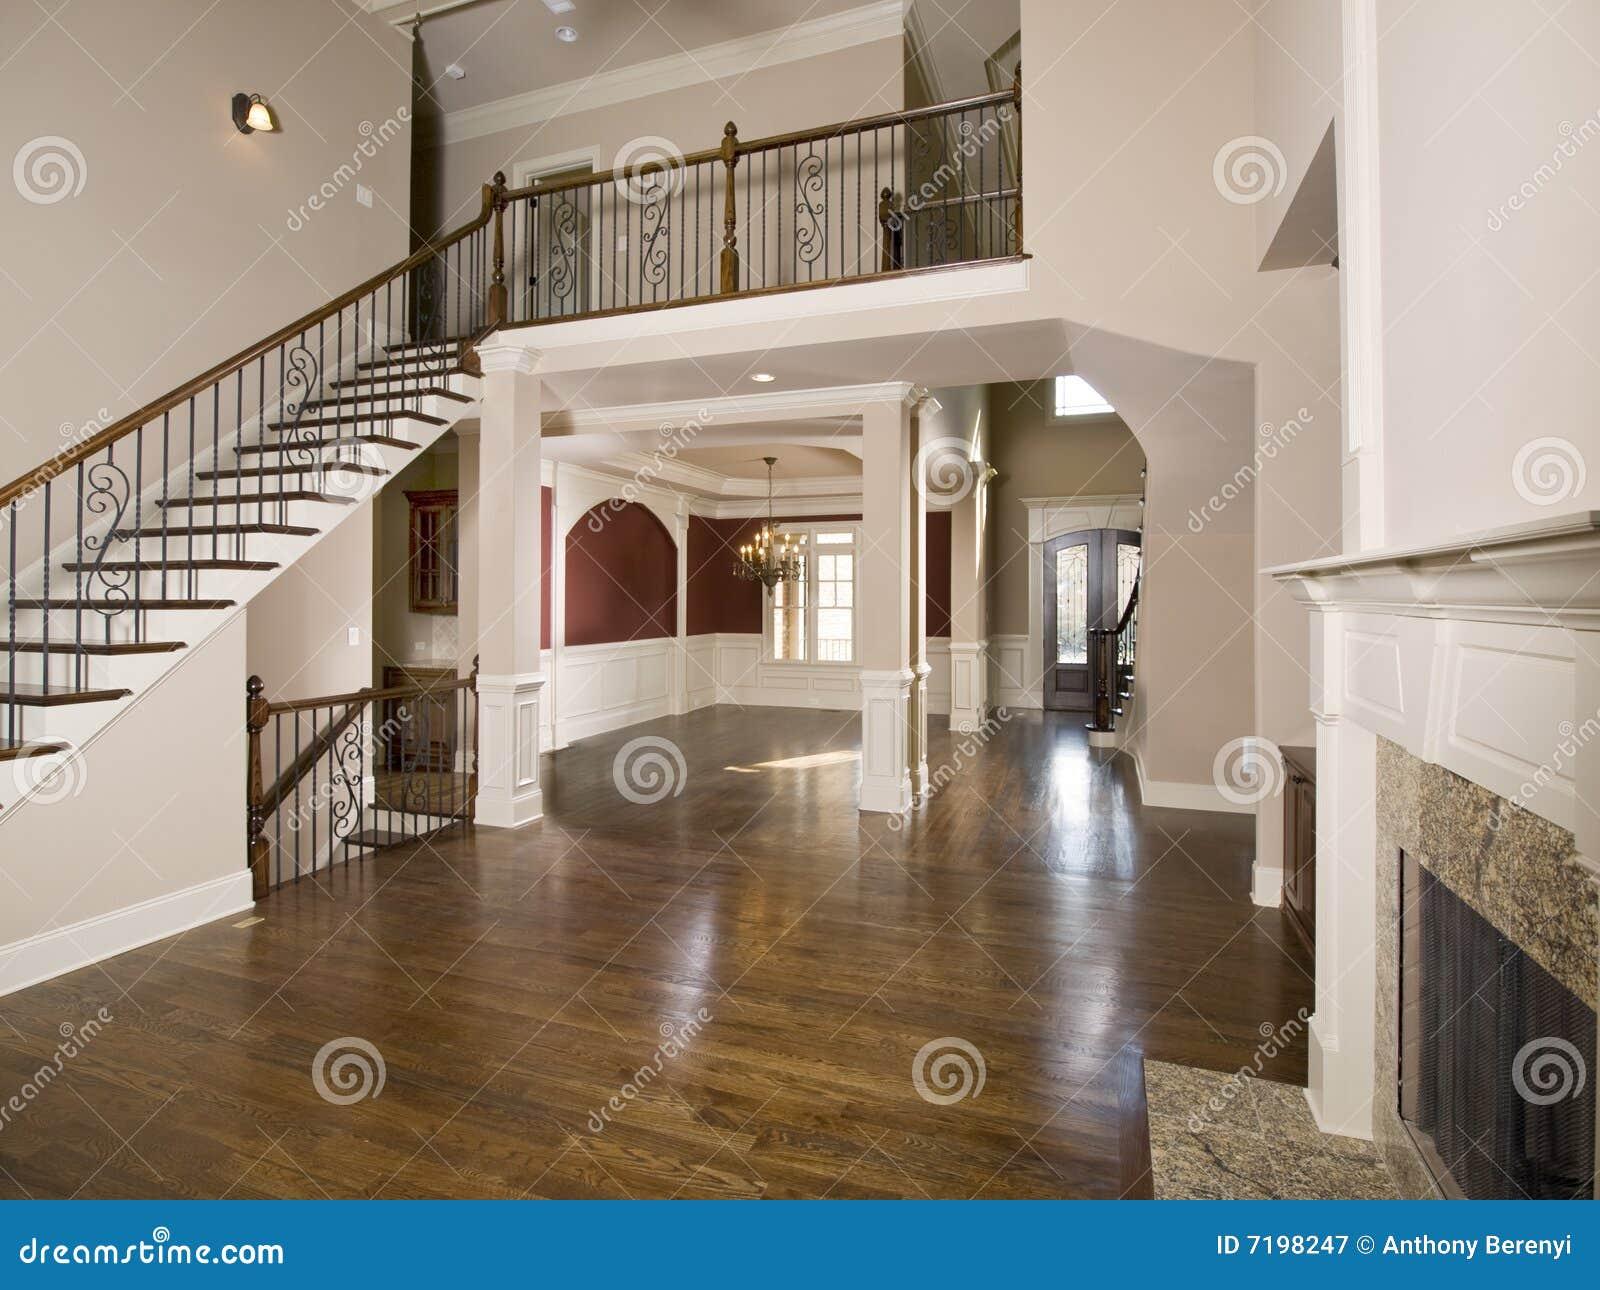 Mezzanine House Design Stairs